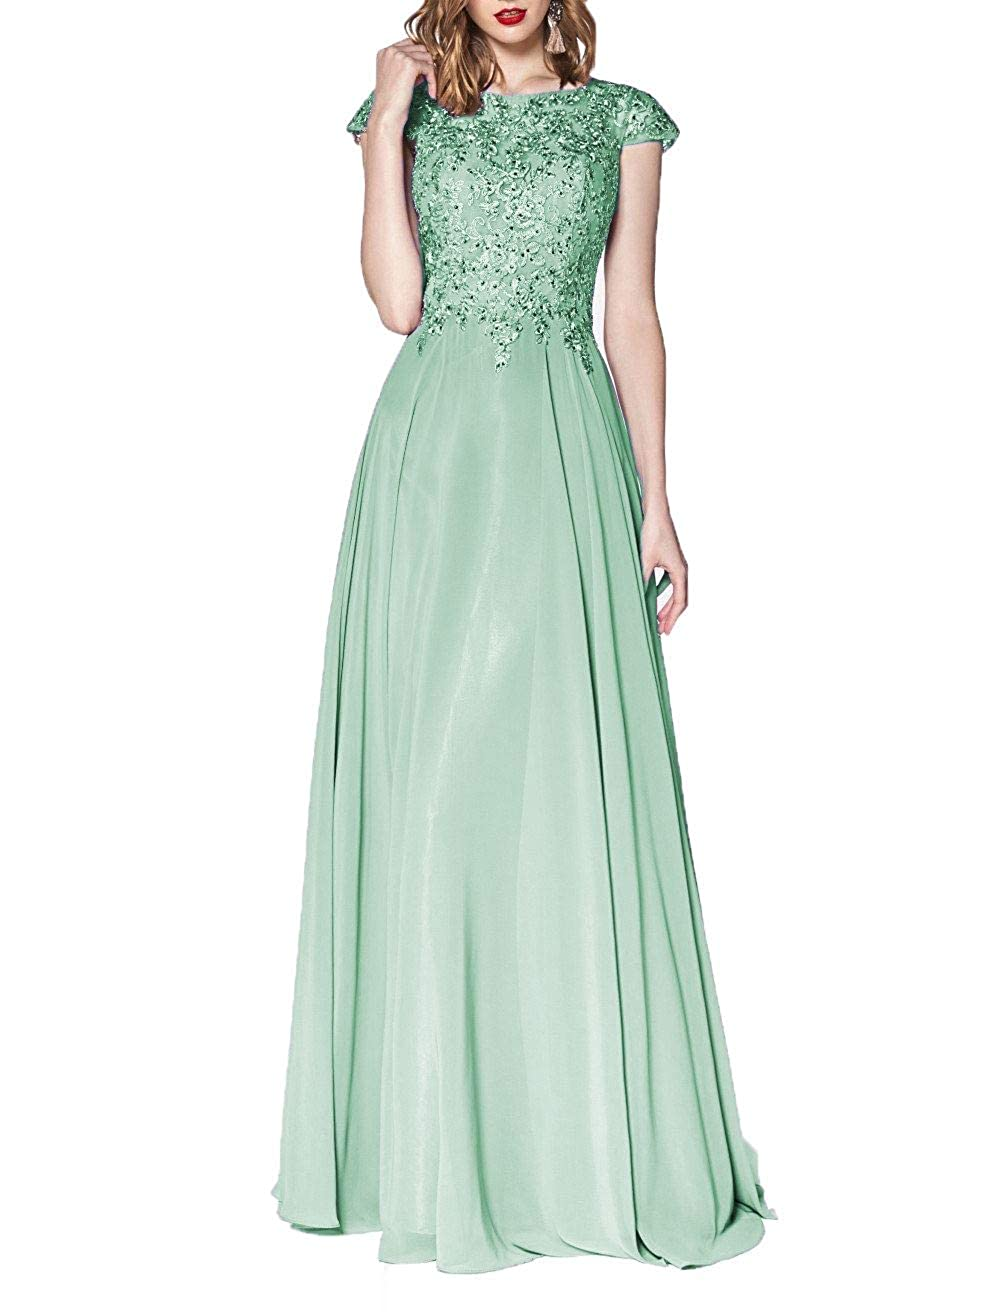 Light Green Wanshaqin Women's Illusion Neckline Jeweled Waist Long Evening Gown Prom Formal Dress Bridesmaid Gown